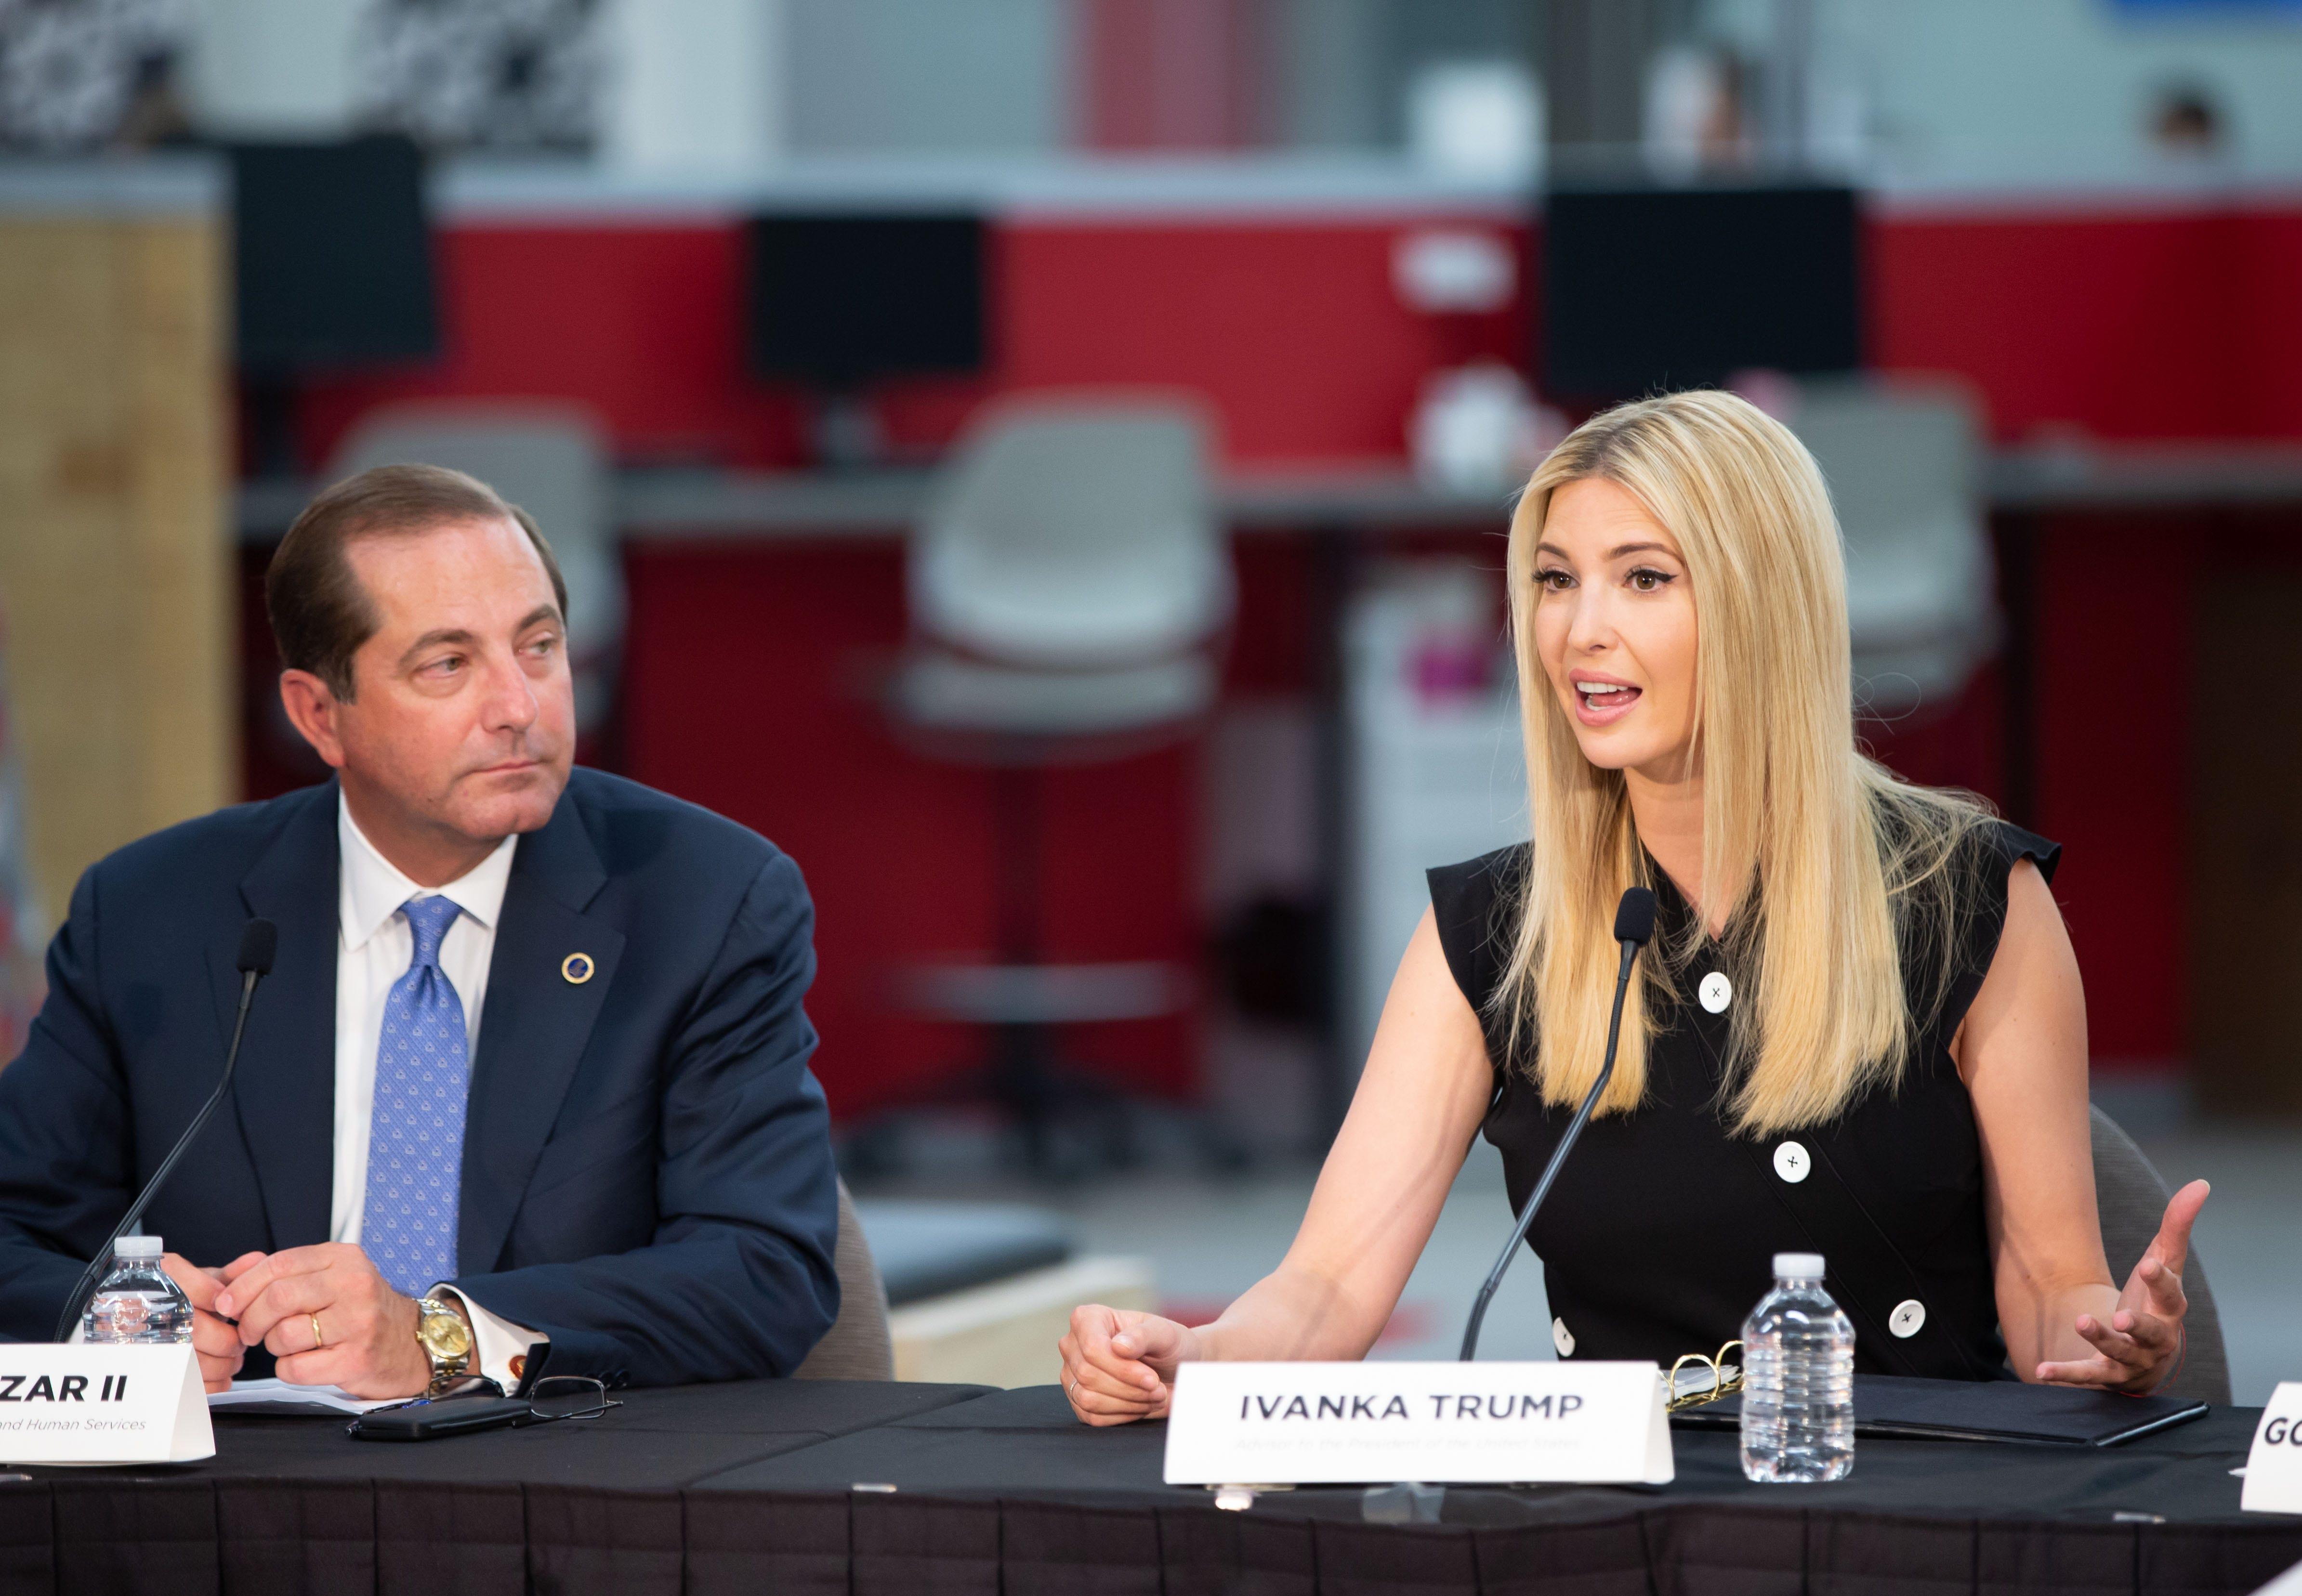 Ivanka Trump And Gov Kim Reynolds Talk Job Training At Iowa Hy Vee Center